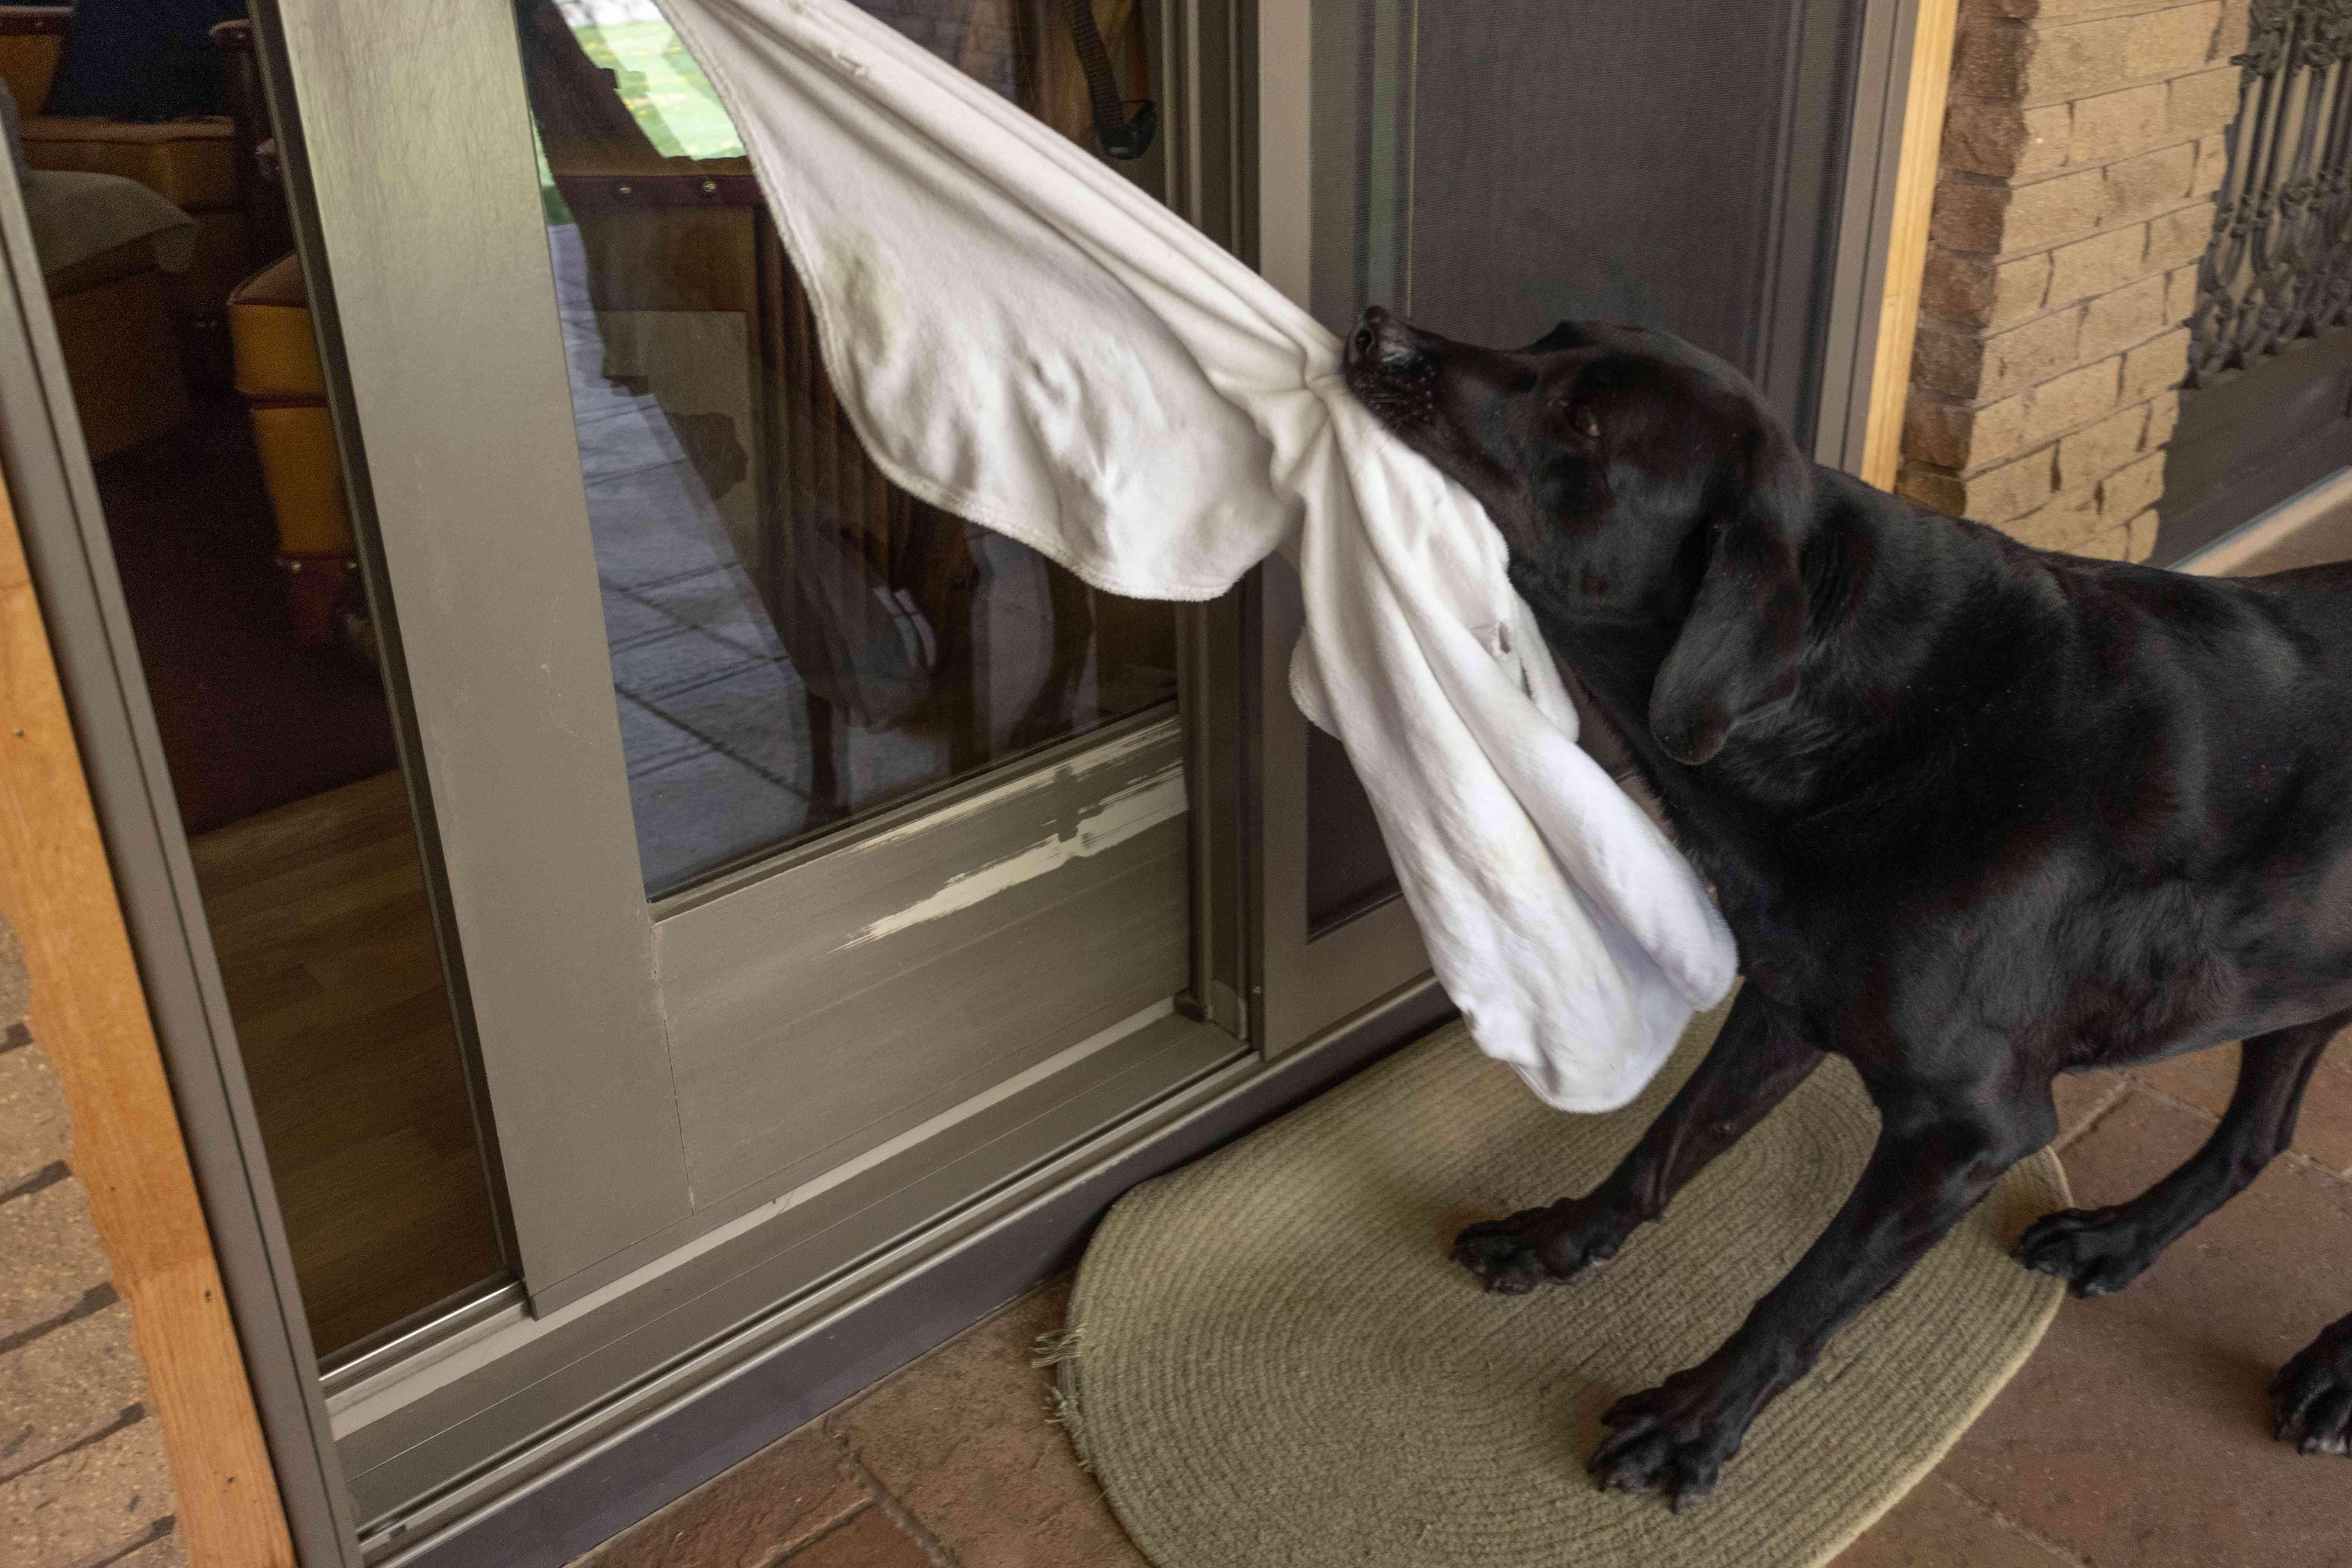 black dog uses white towel to